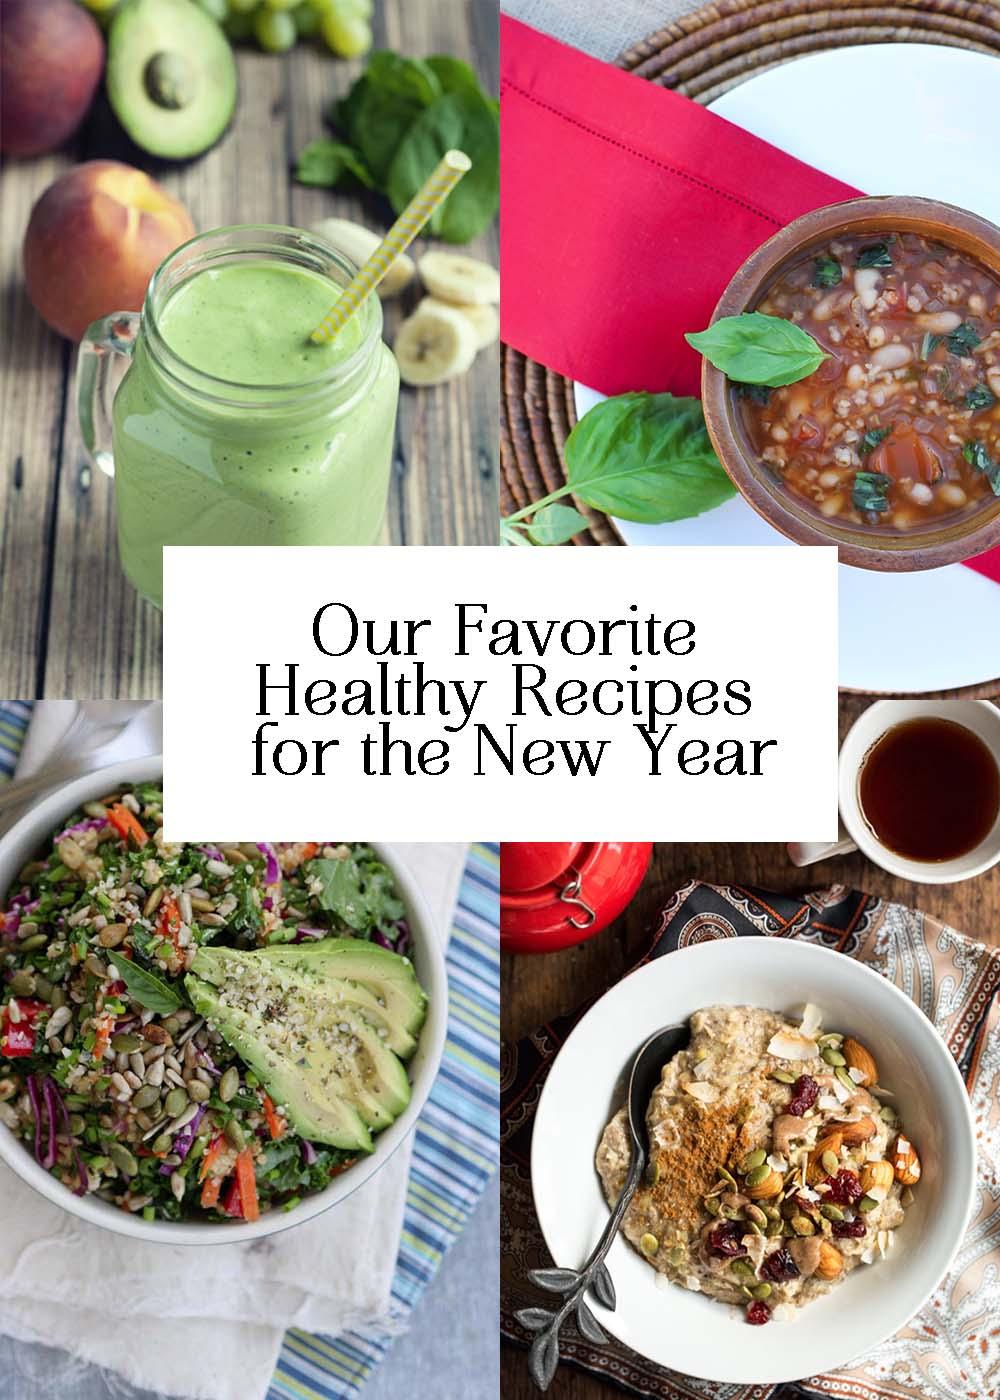 Our 5 Favorite Detox Recipes